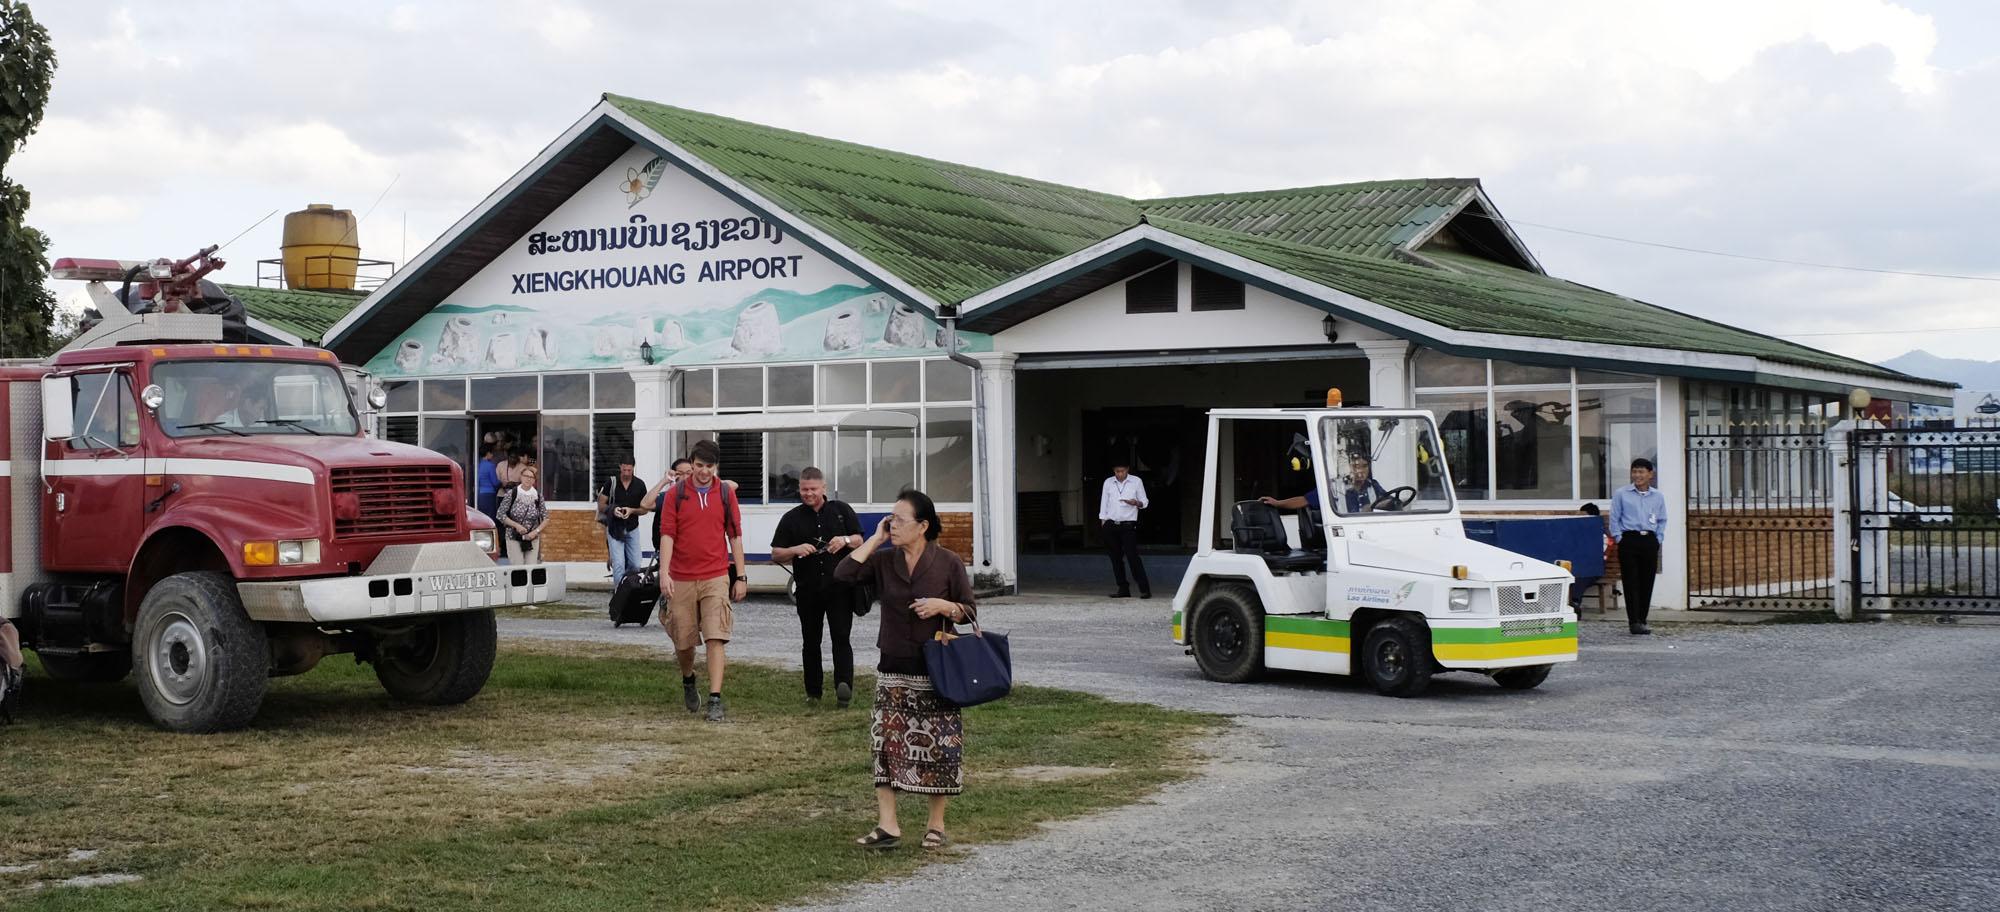 reise-ansichten Flughafen Phonsavan Laos